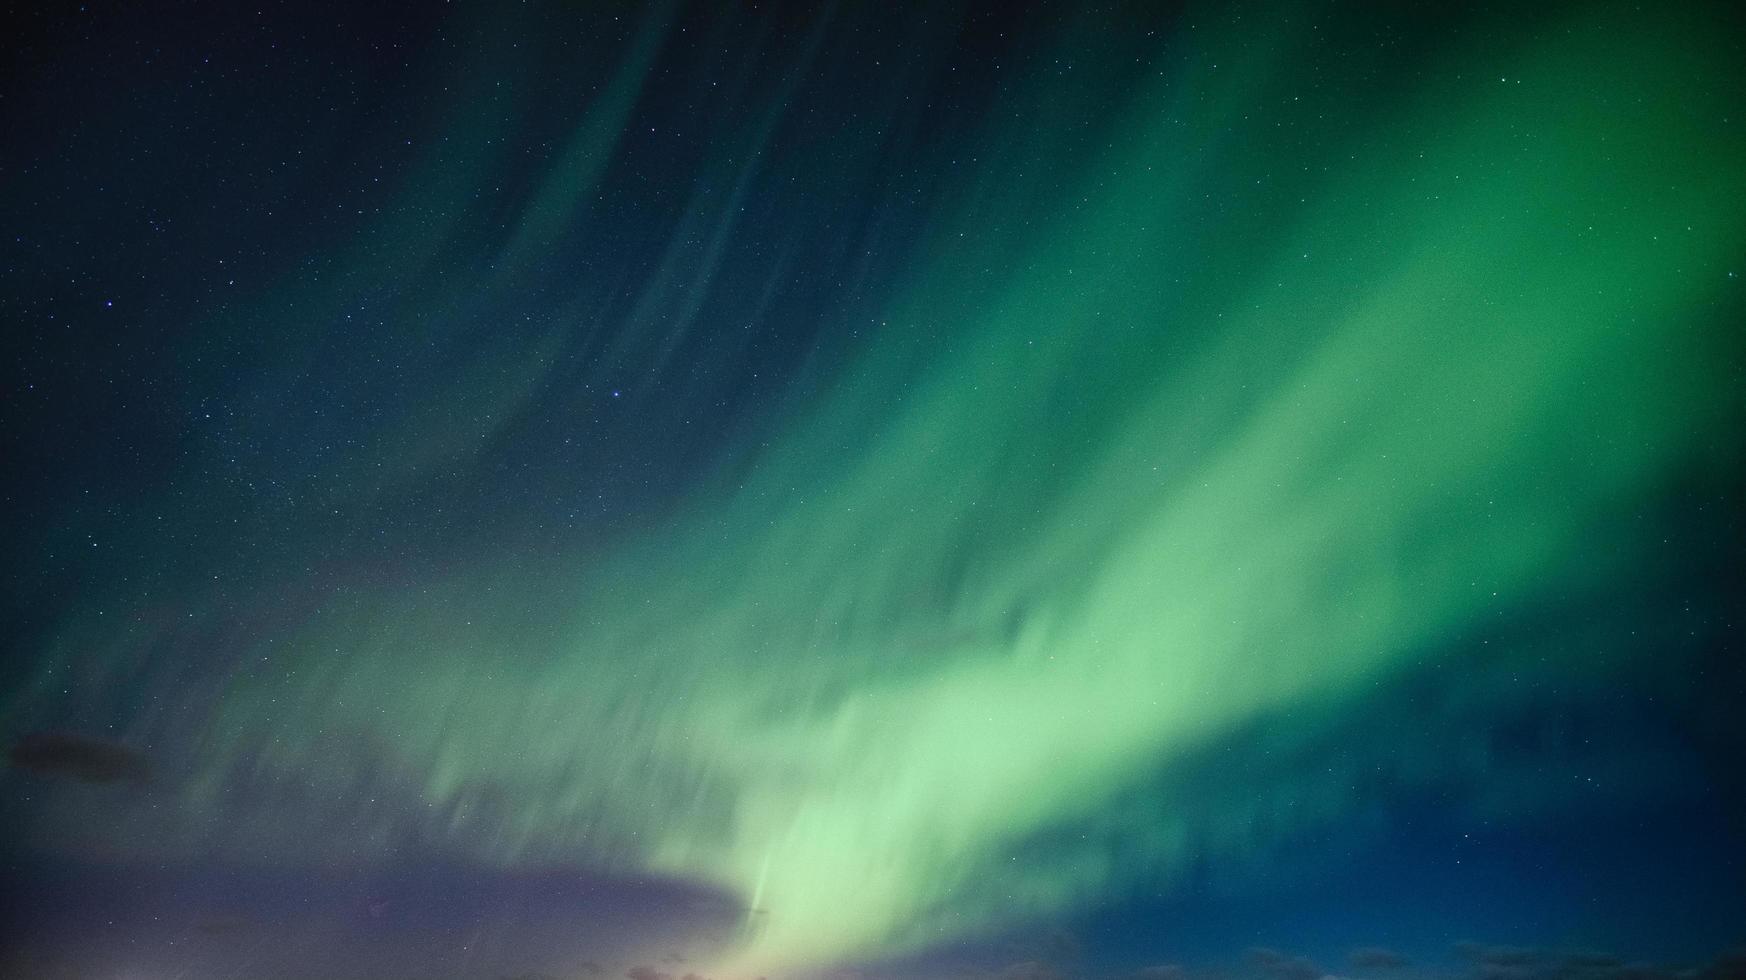 Aurora Borealis and stars in the sky photo